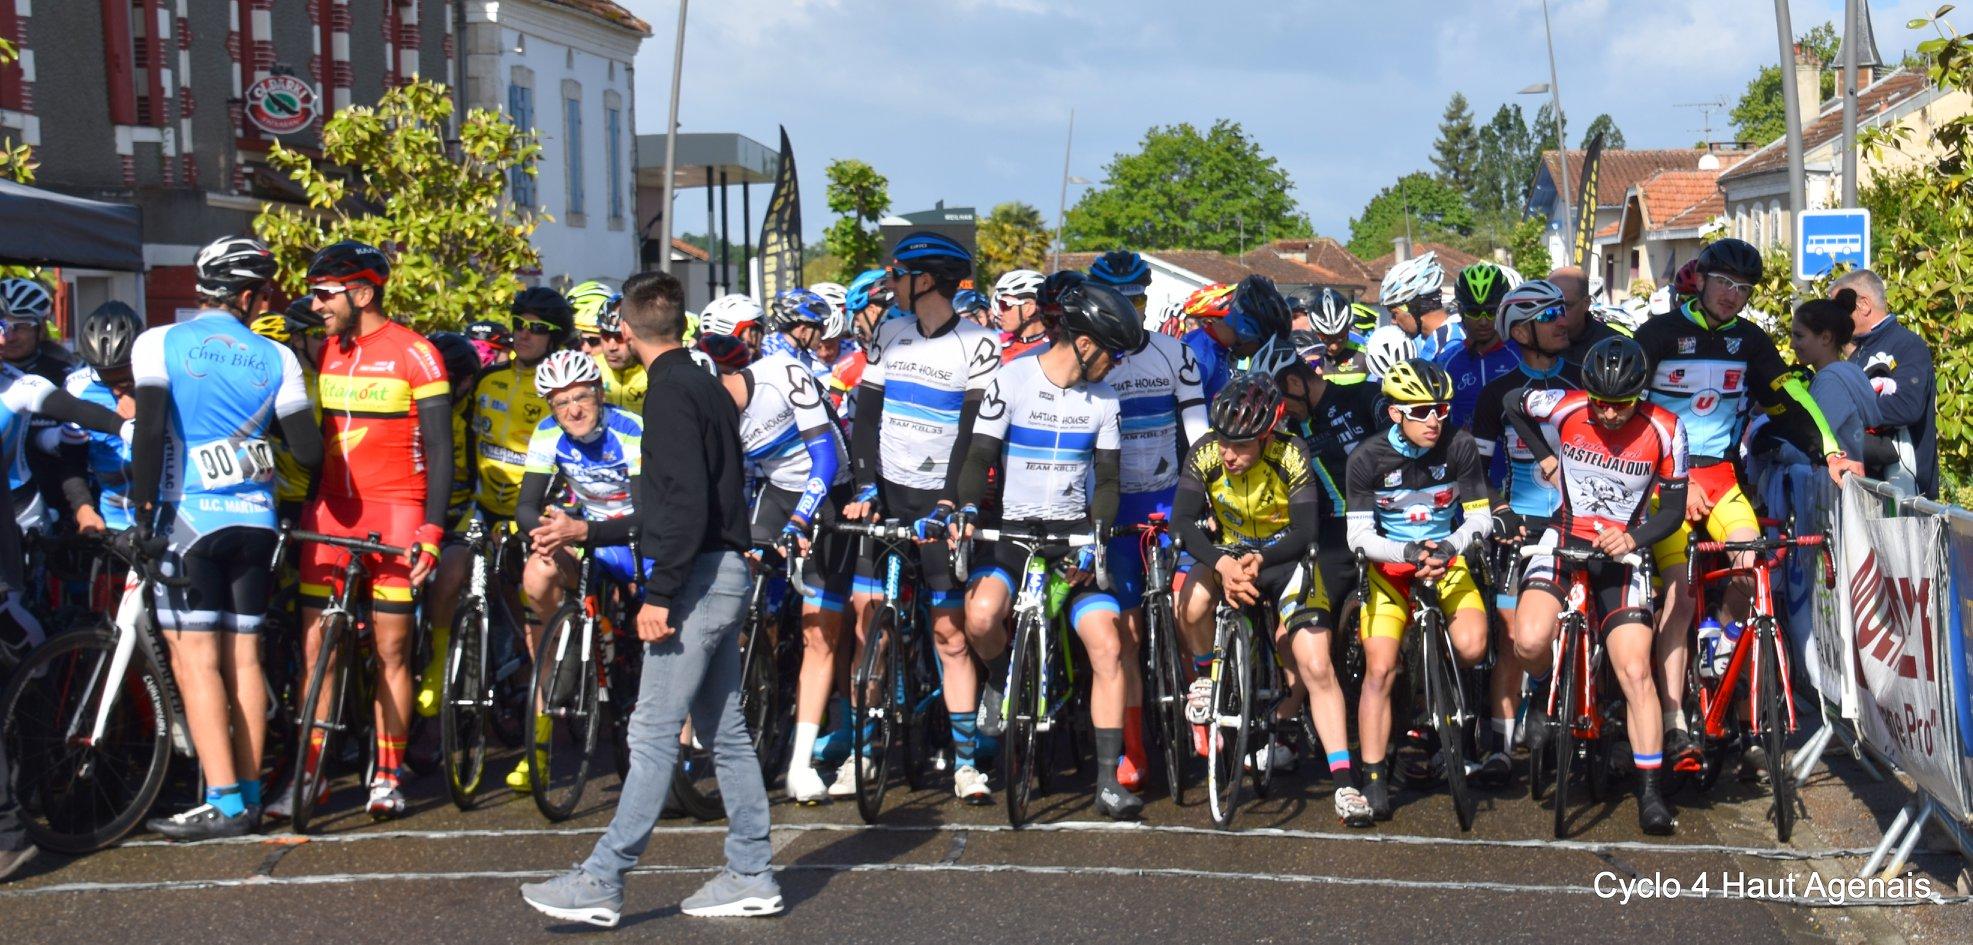 2018-05-13-Tour Chalosse-04.jpg